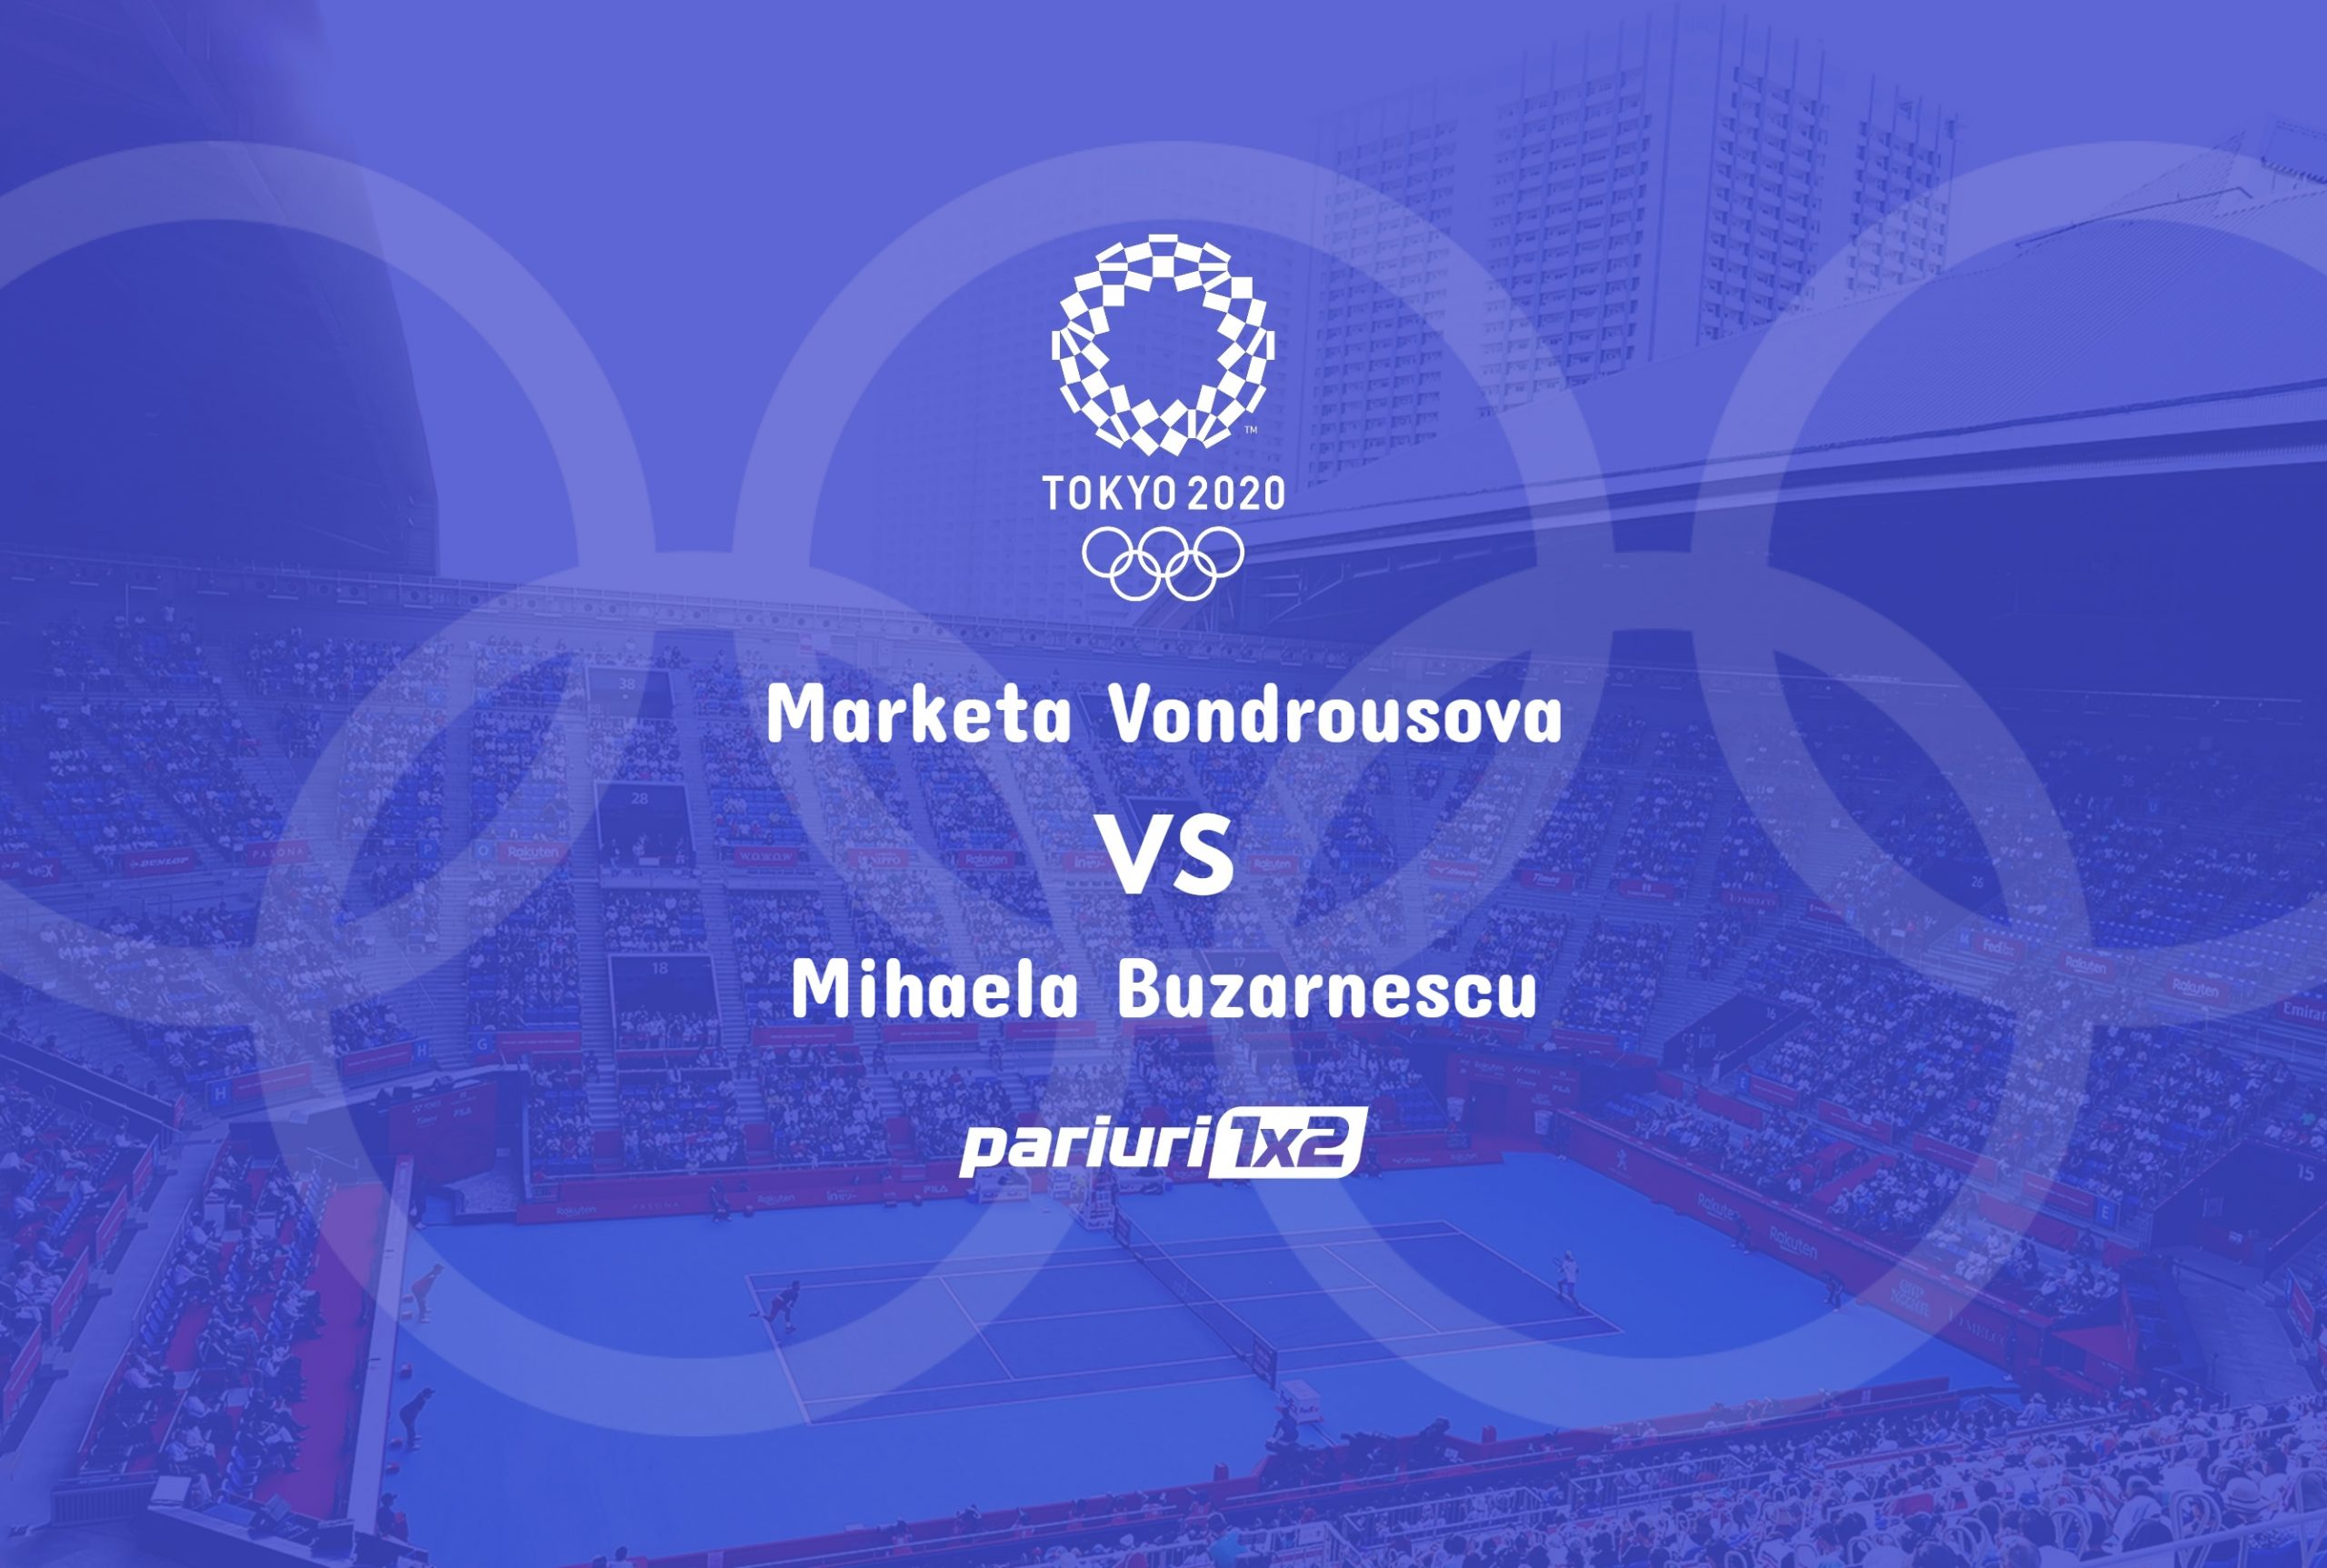 Vondrousova - Buzarnescu